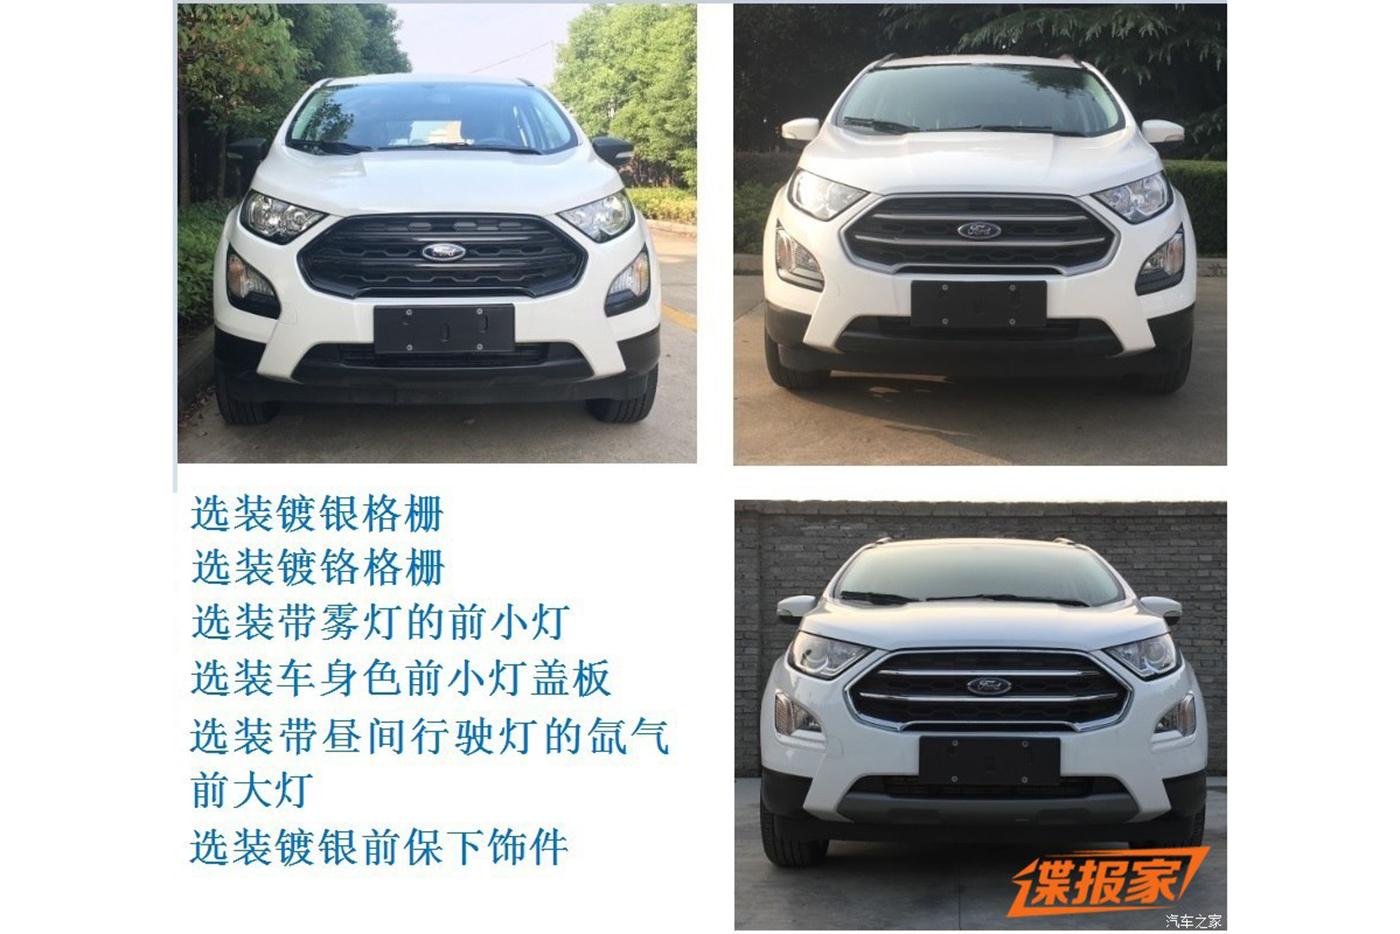 ford-ecosport-2017-3.jpg